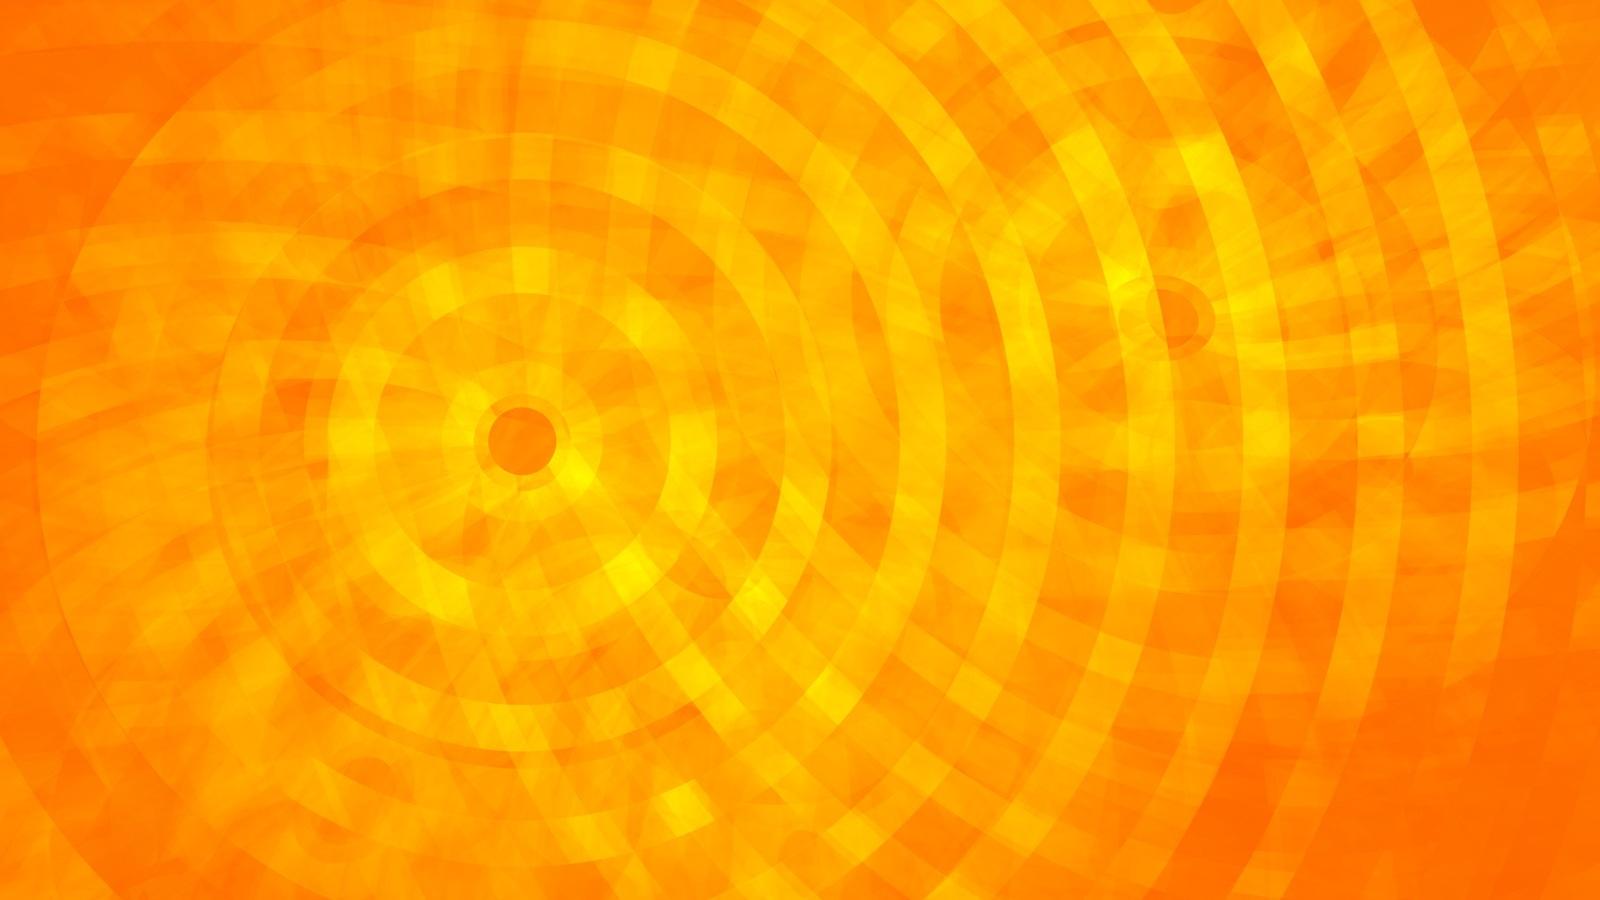 abstract-circle-orange-rings-x0.jpg